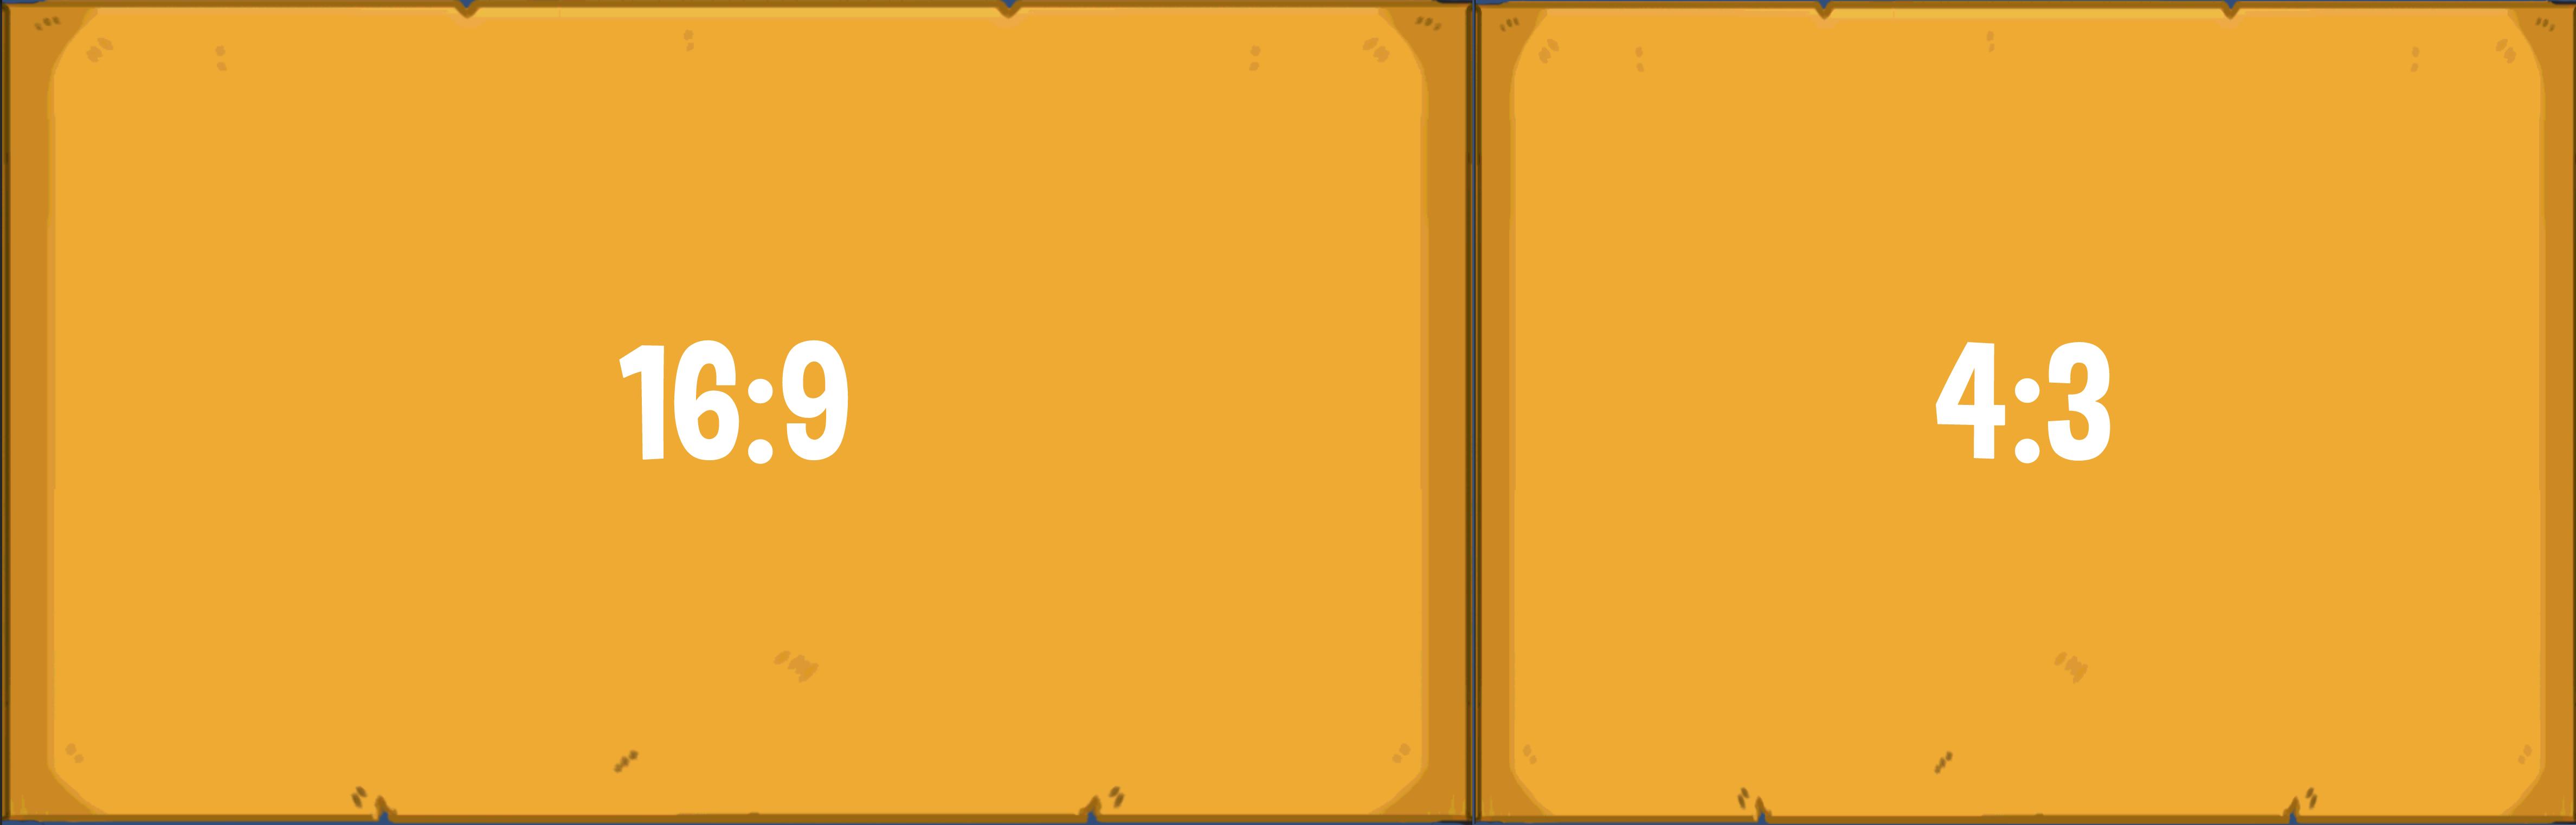 Unity UI Tutorial: Canvas and Scalability - Cat Trap Studios